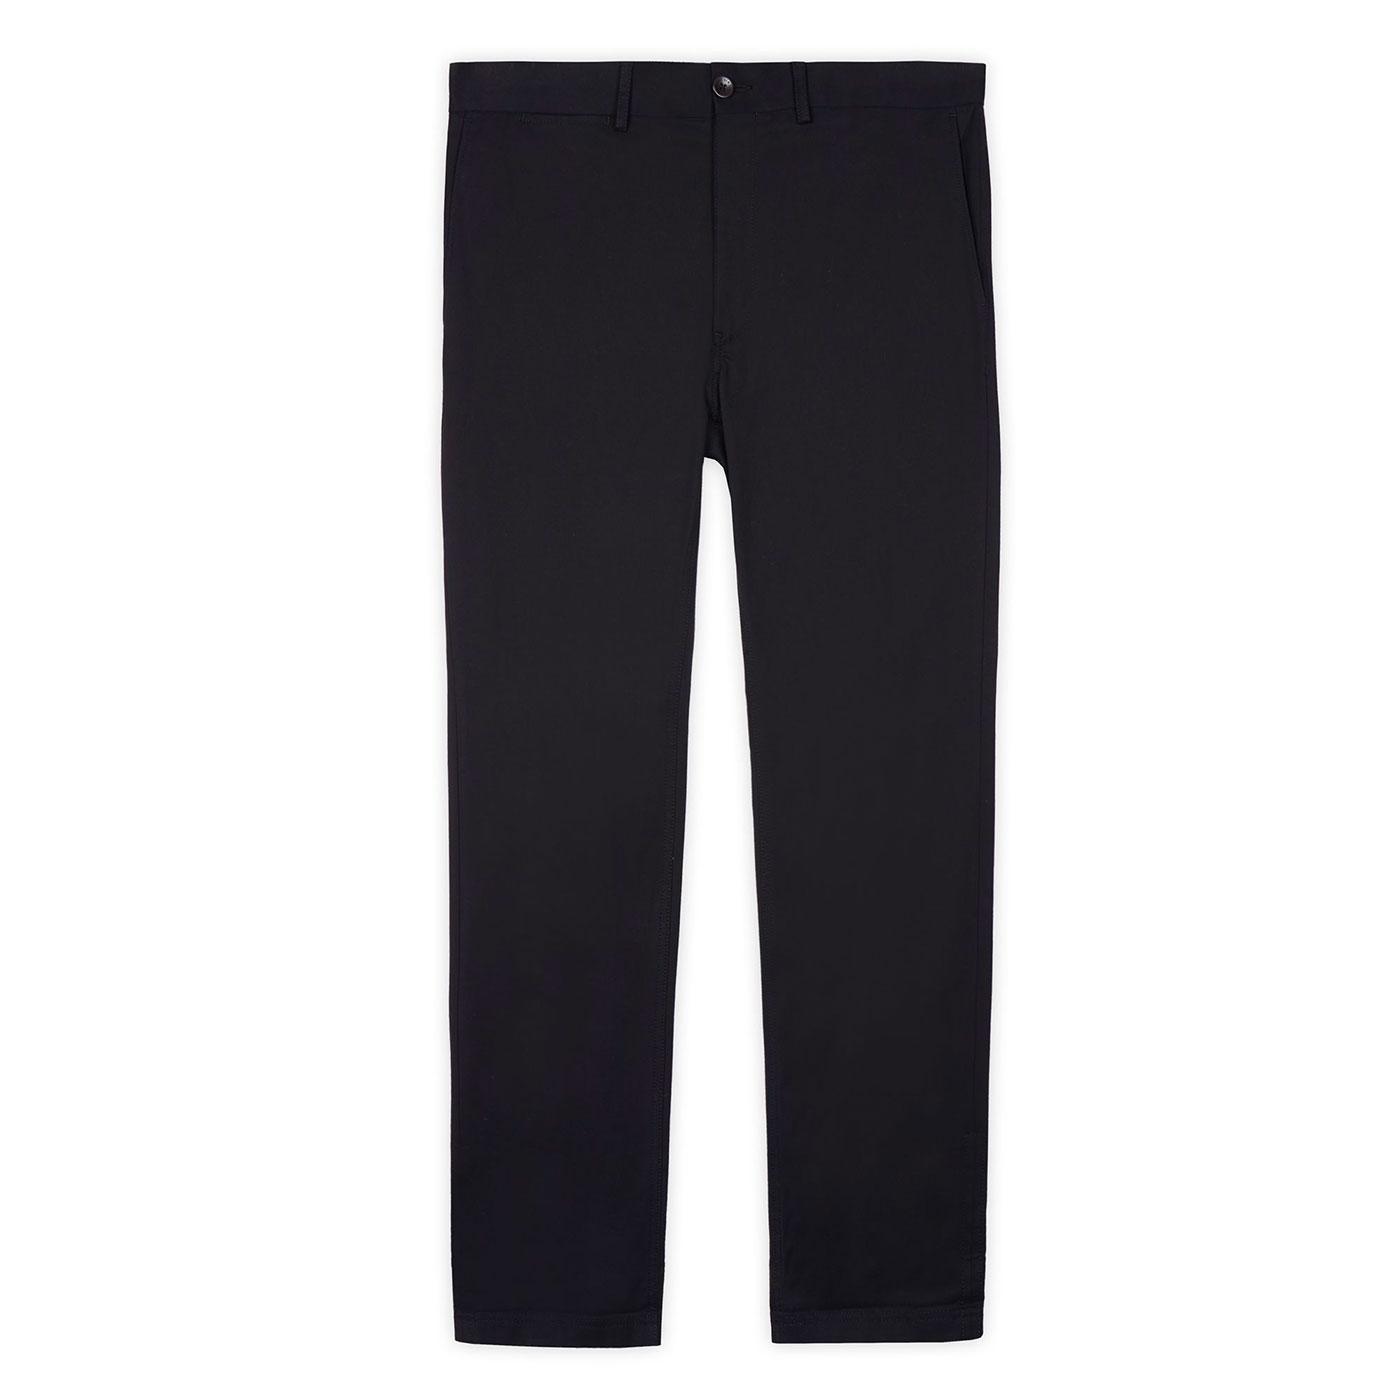 BEN SHERMAN Mens Signature Chino Trousers in Black